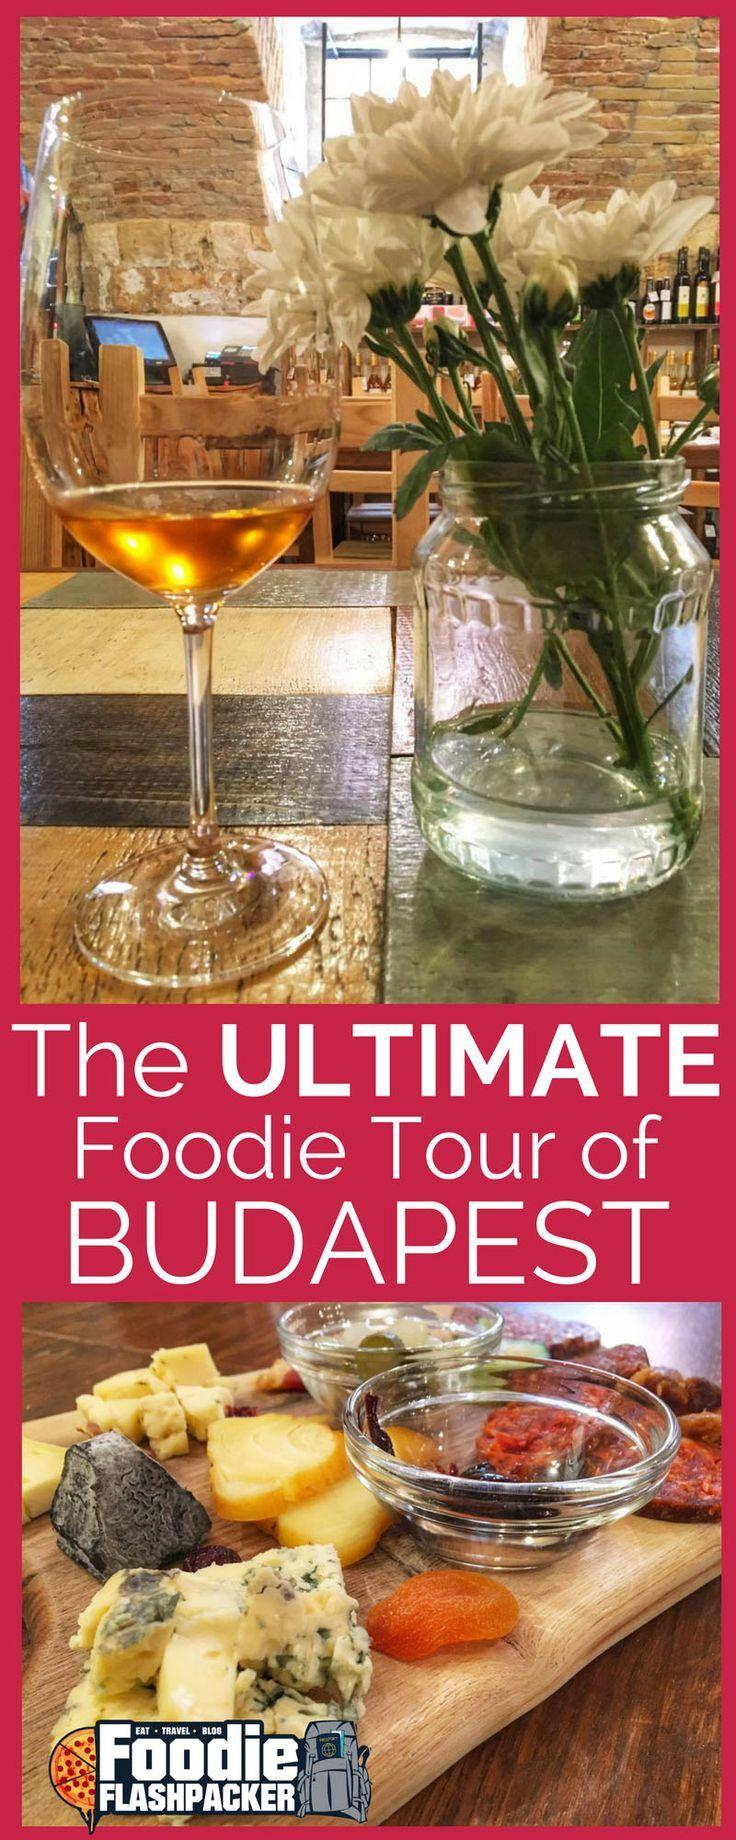 Jewish cuisine walking food tour of budapest with taste